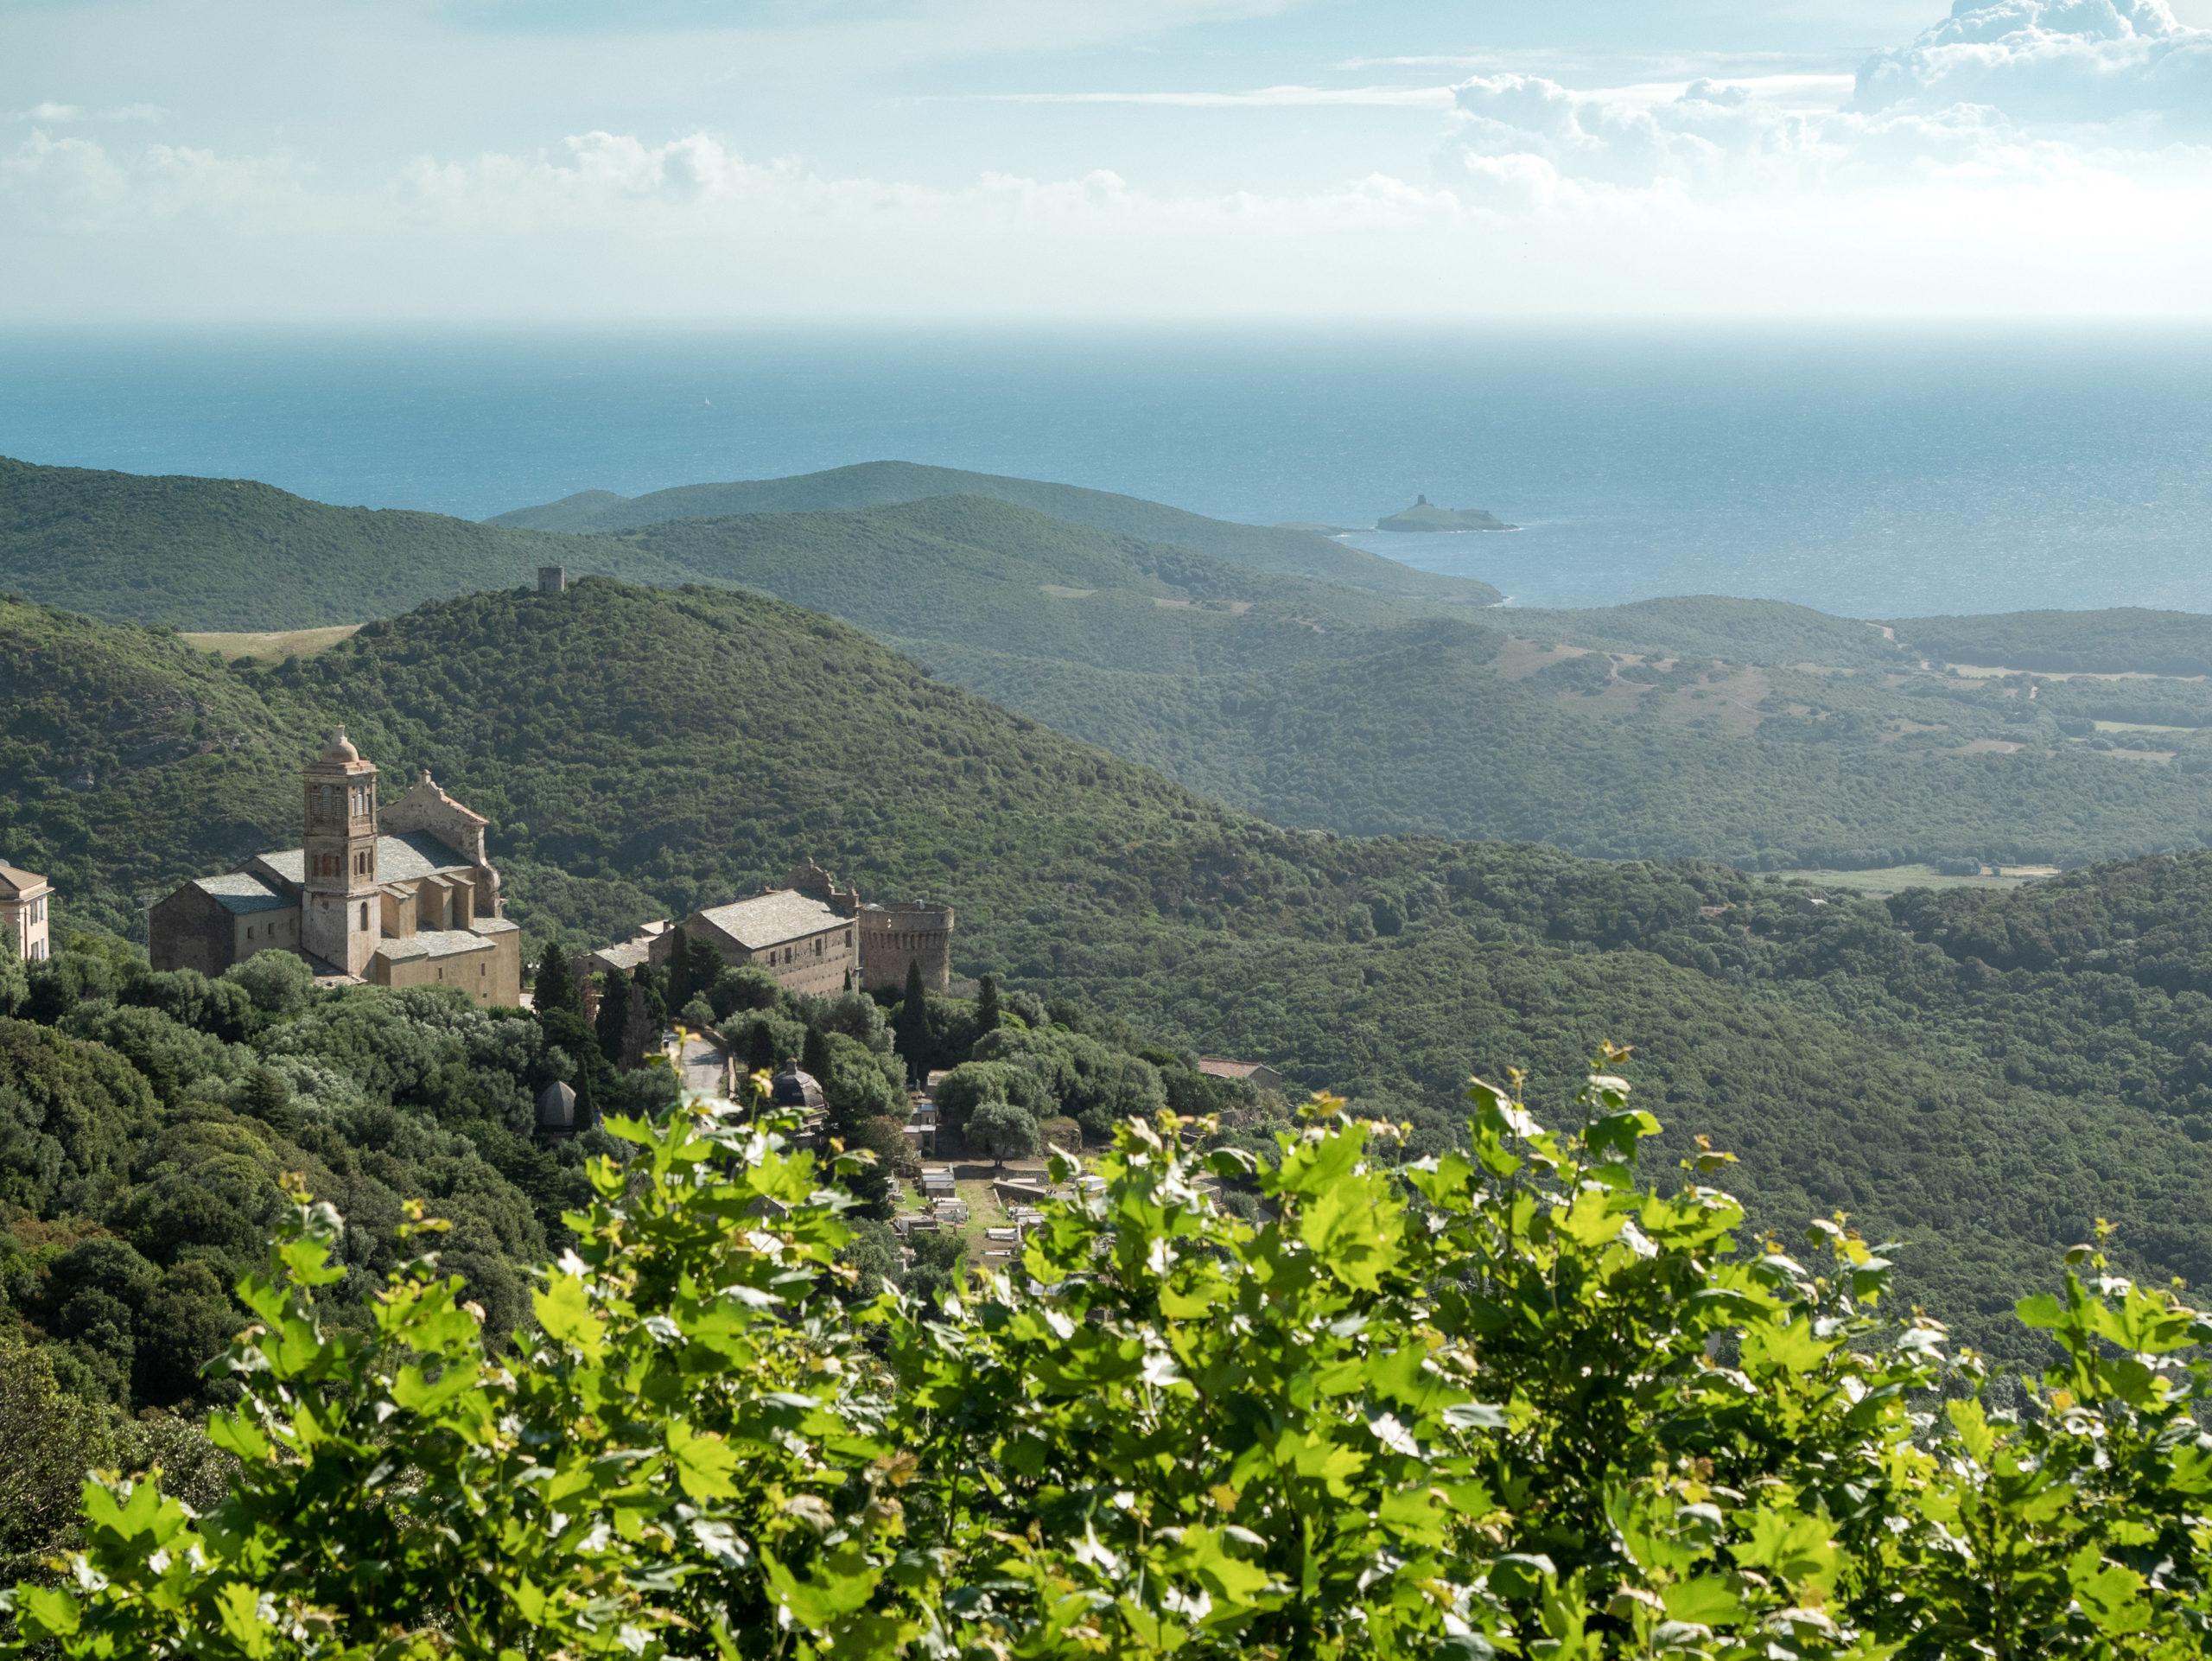 Visiter le village de Rogliano dans le Cap Corse